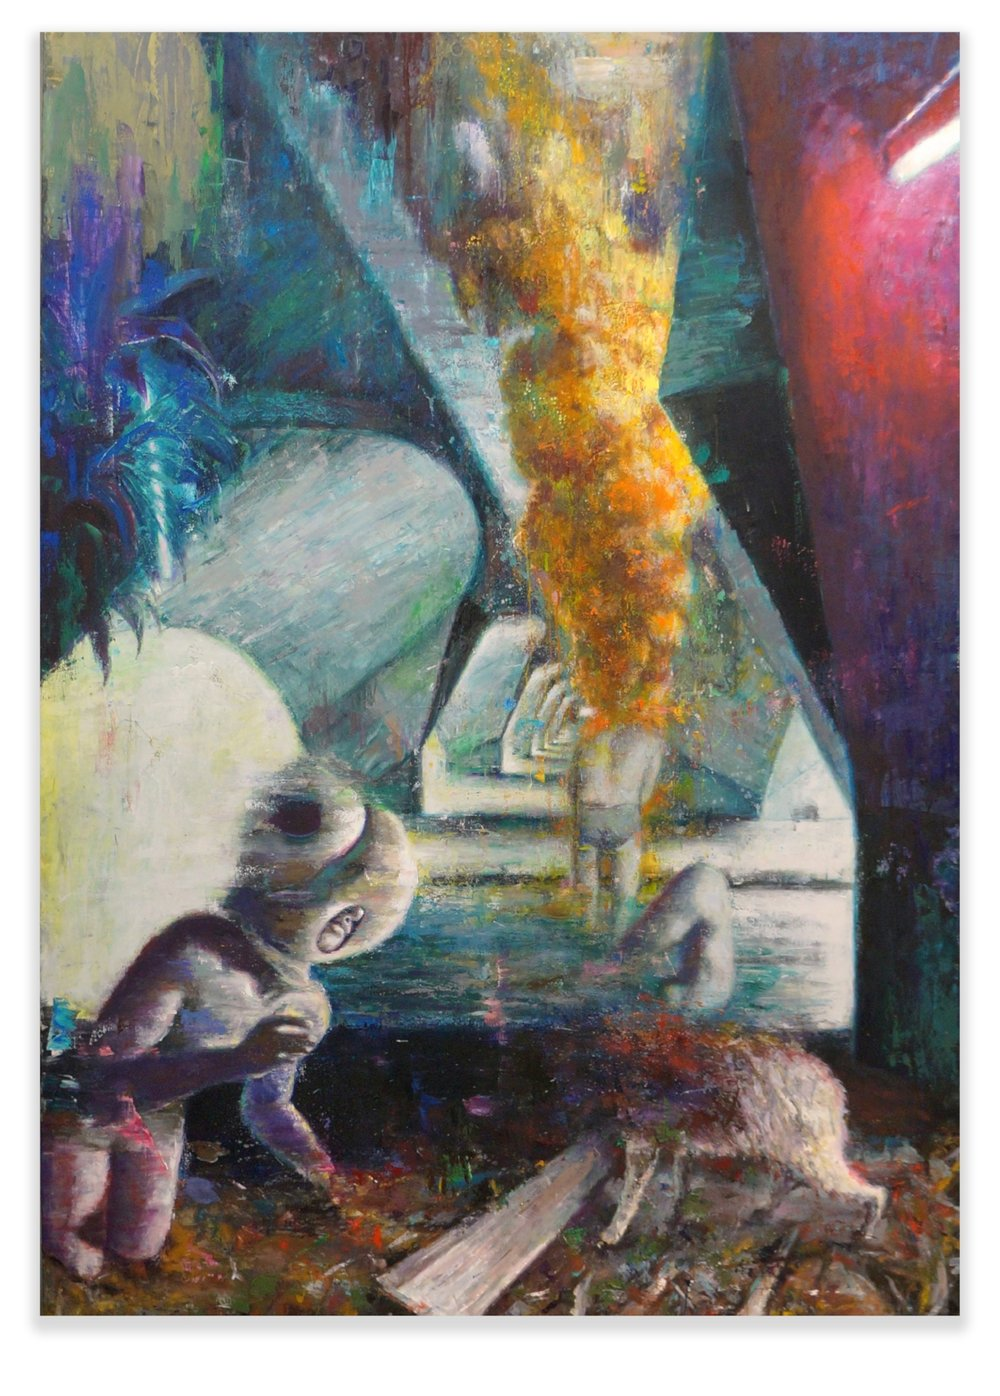 Thermidorians, 2018, oil on canvas, 200x150cm